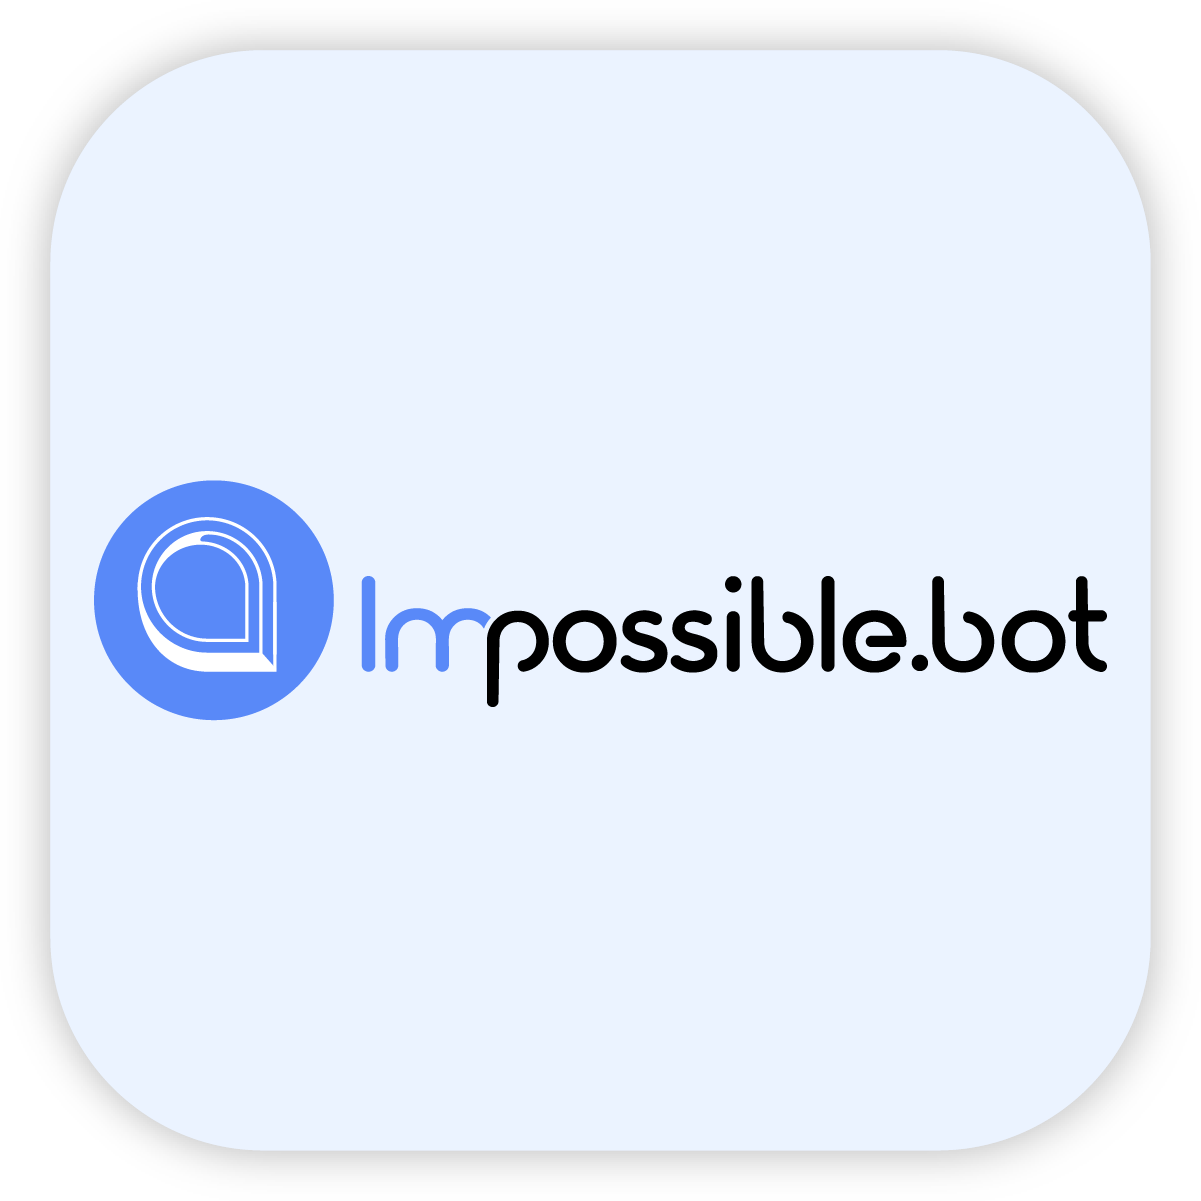 impossible bot logo